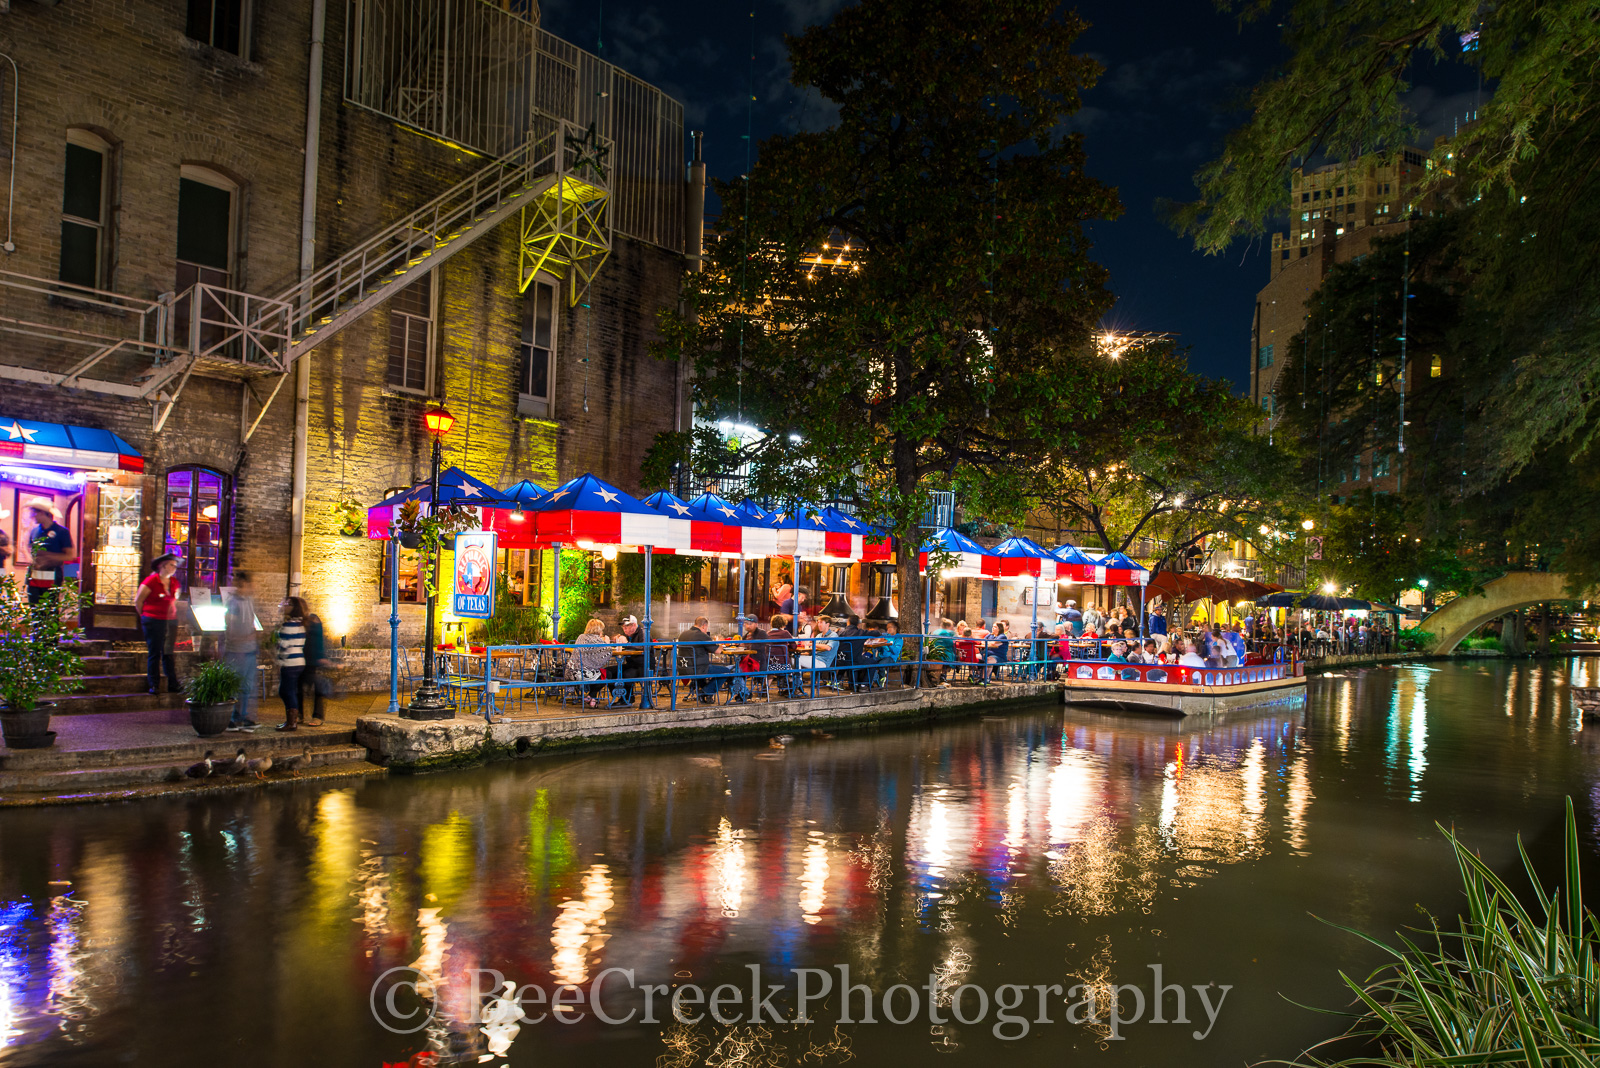 Republic of Texas, River Walk, San Antonio, blue, boat, city, cityscape, dinner, downtown, night, red, restaurant, white, photo